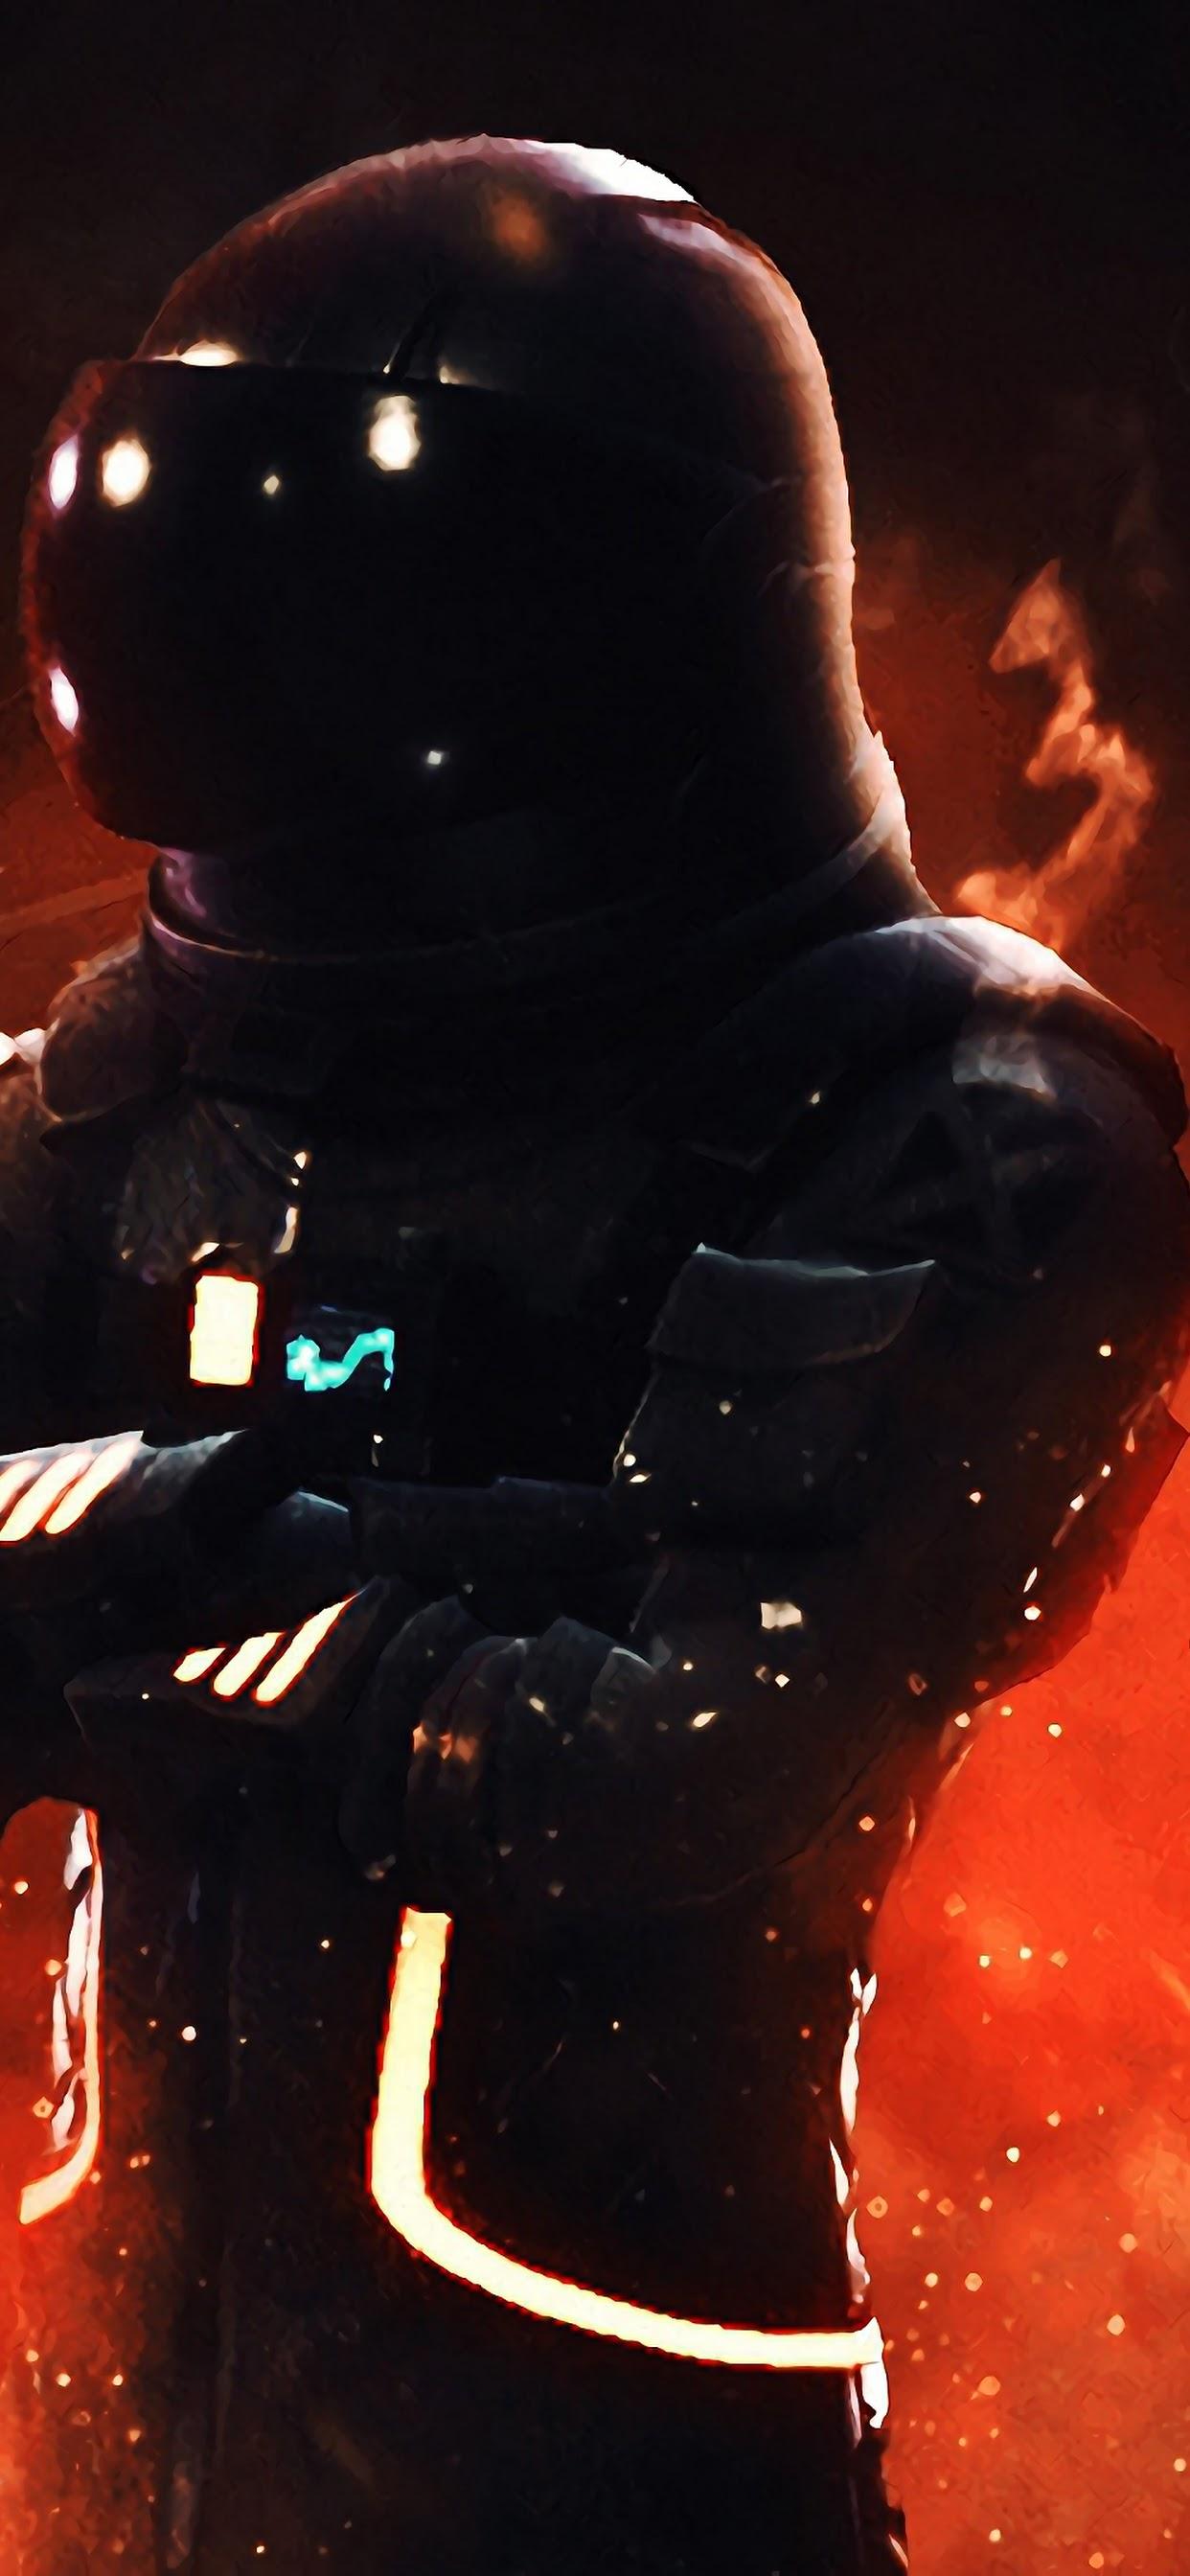 Dark Voyager Fortnite Battle Royale 4k Wallpaper 19